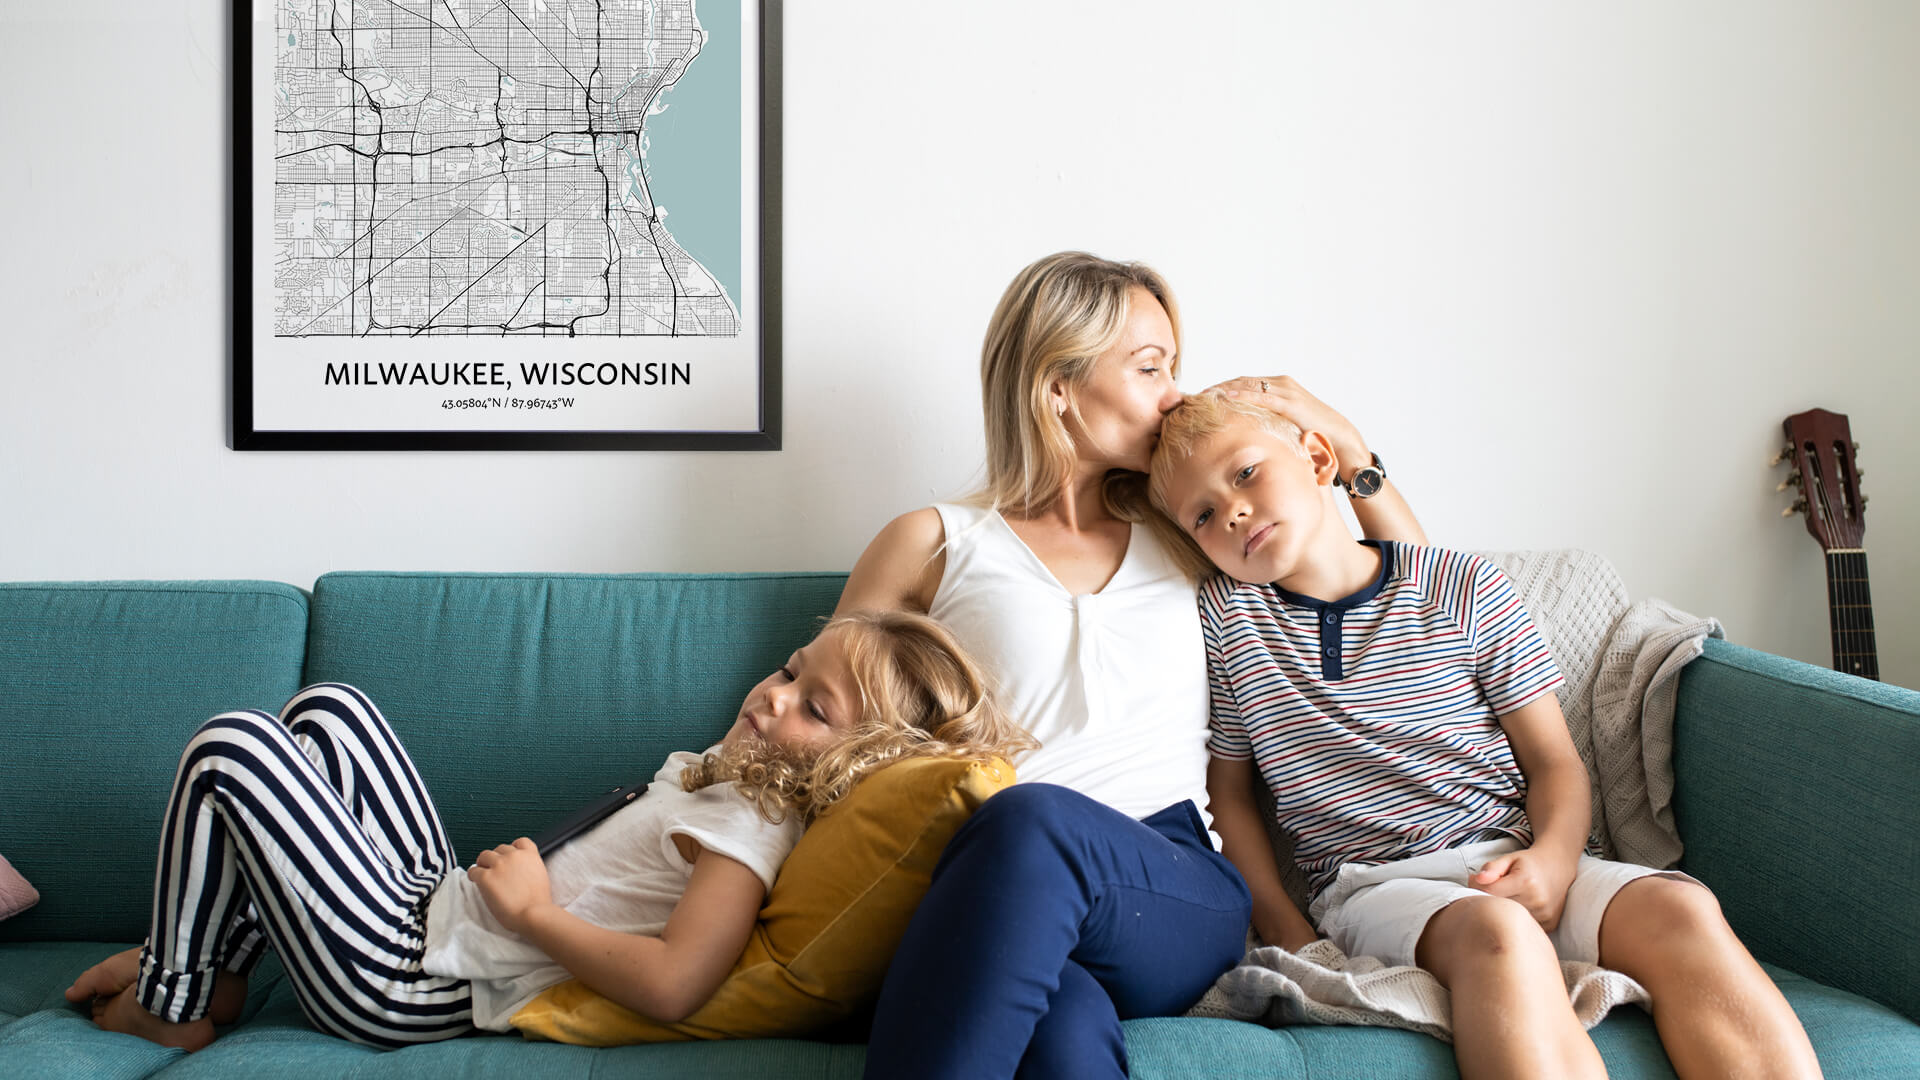 Milwaukee map poster